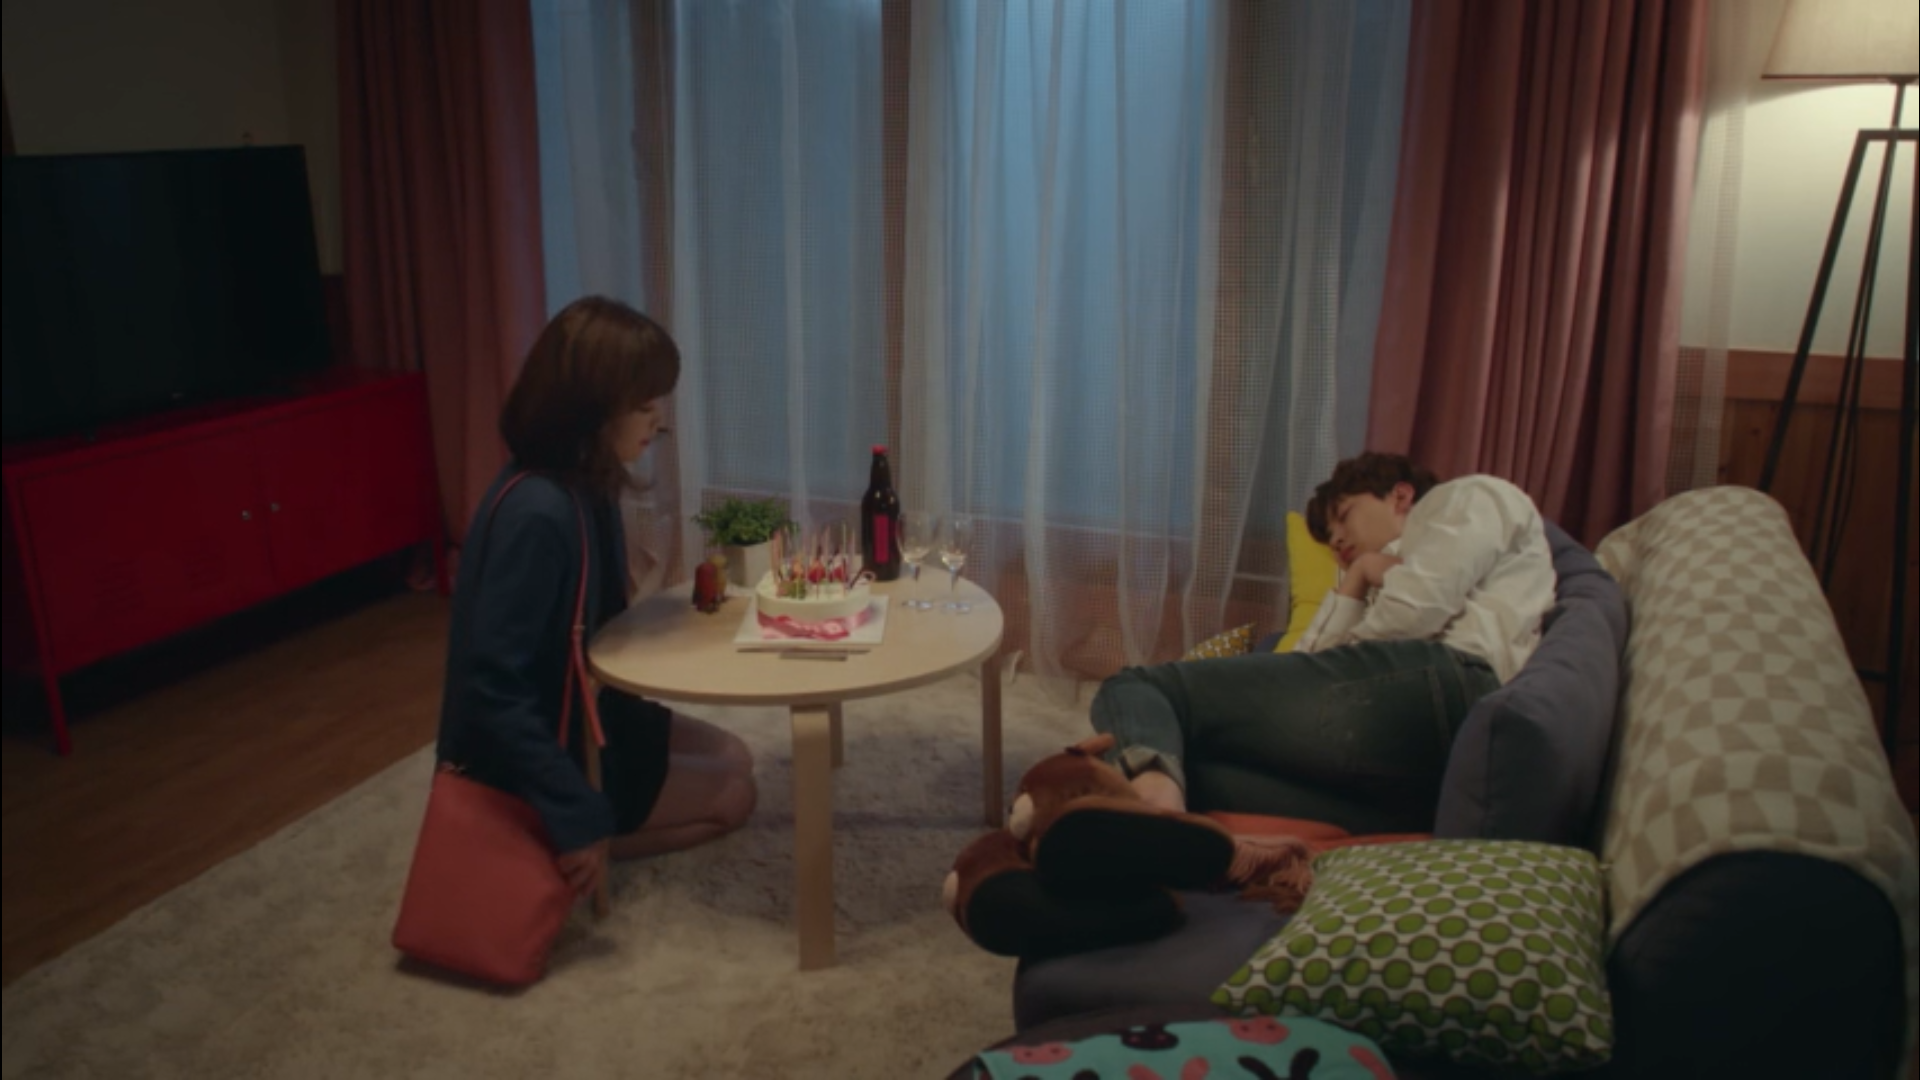 Wednesday 3:30 PM Seon Eun-woo and Yoon Jae-won on her birthday